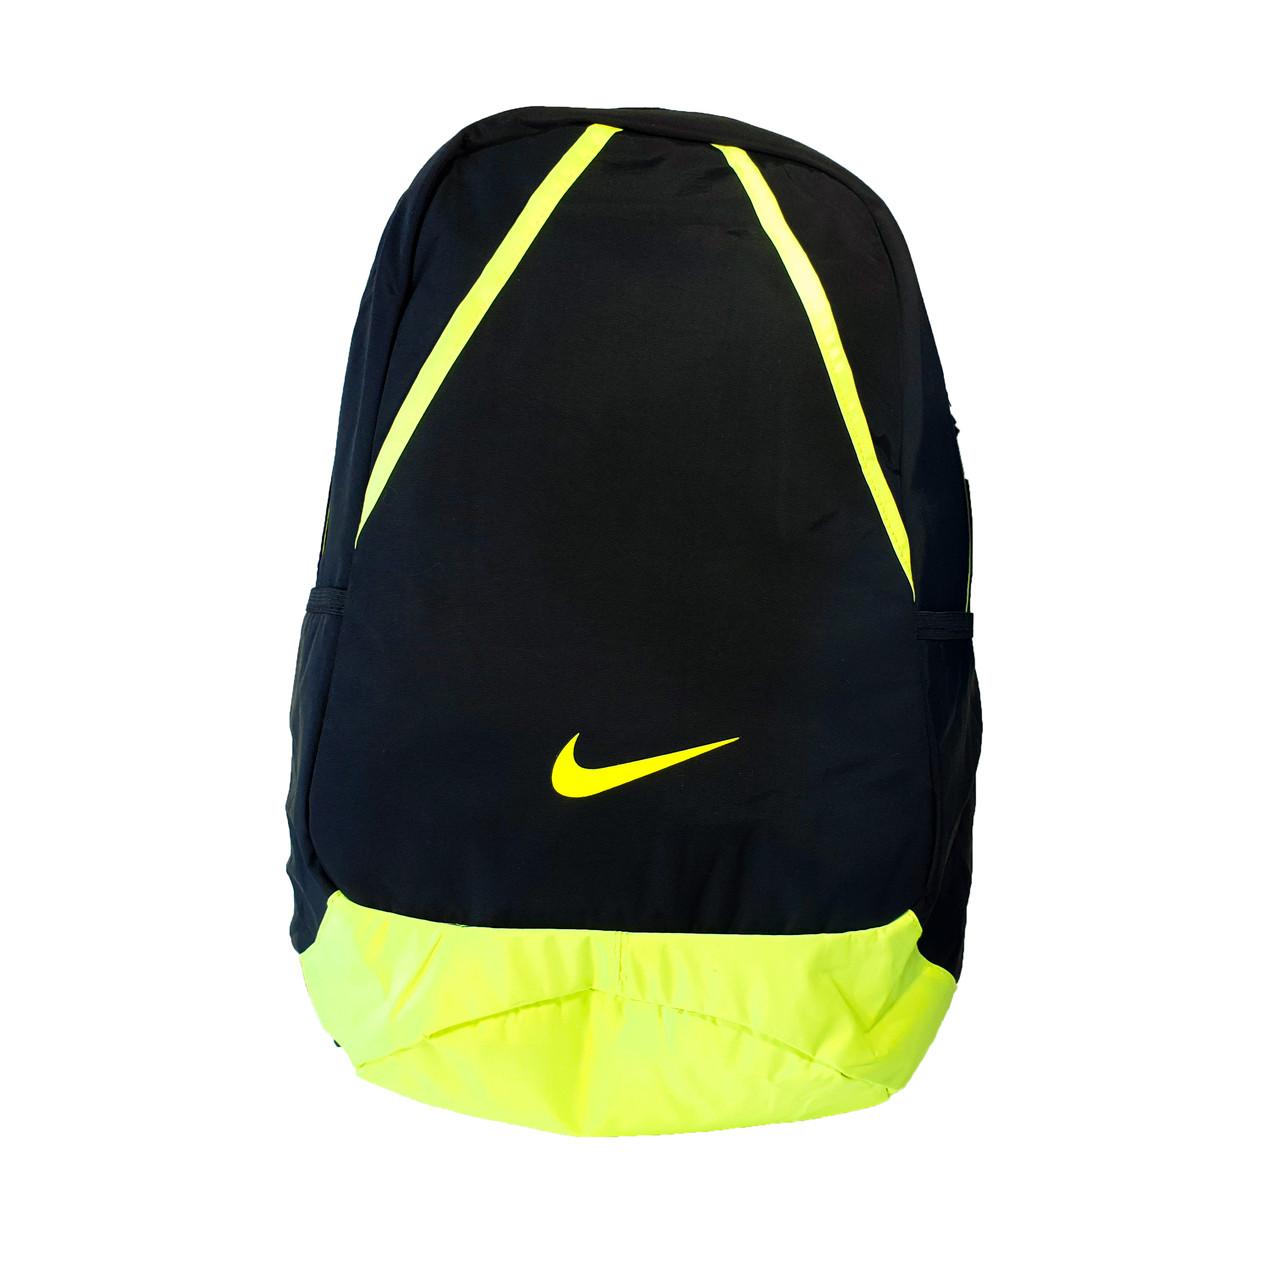 Спортивный рюкзак Nike, РАСПРОДАЖА